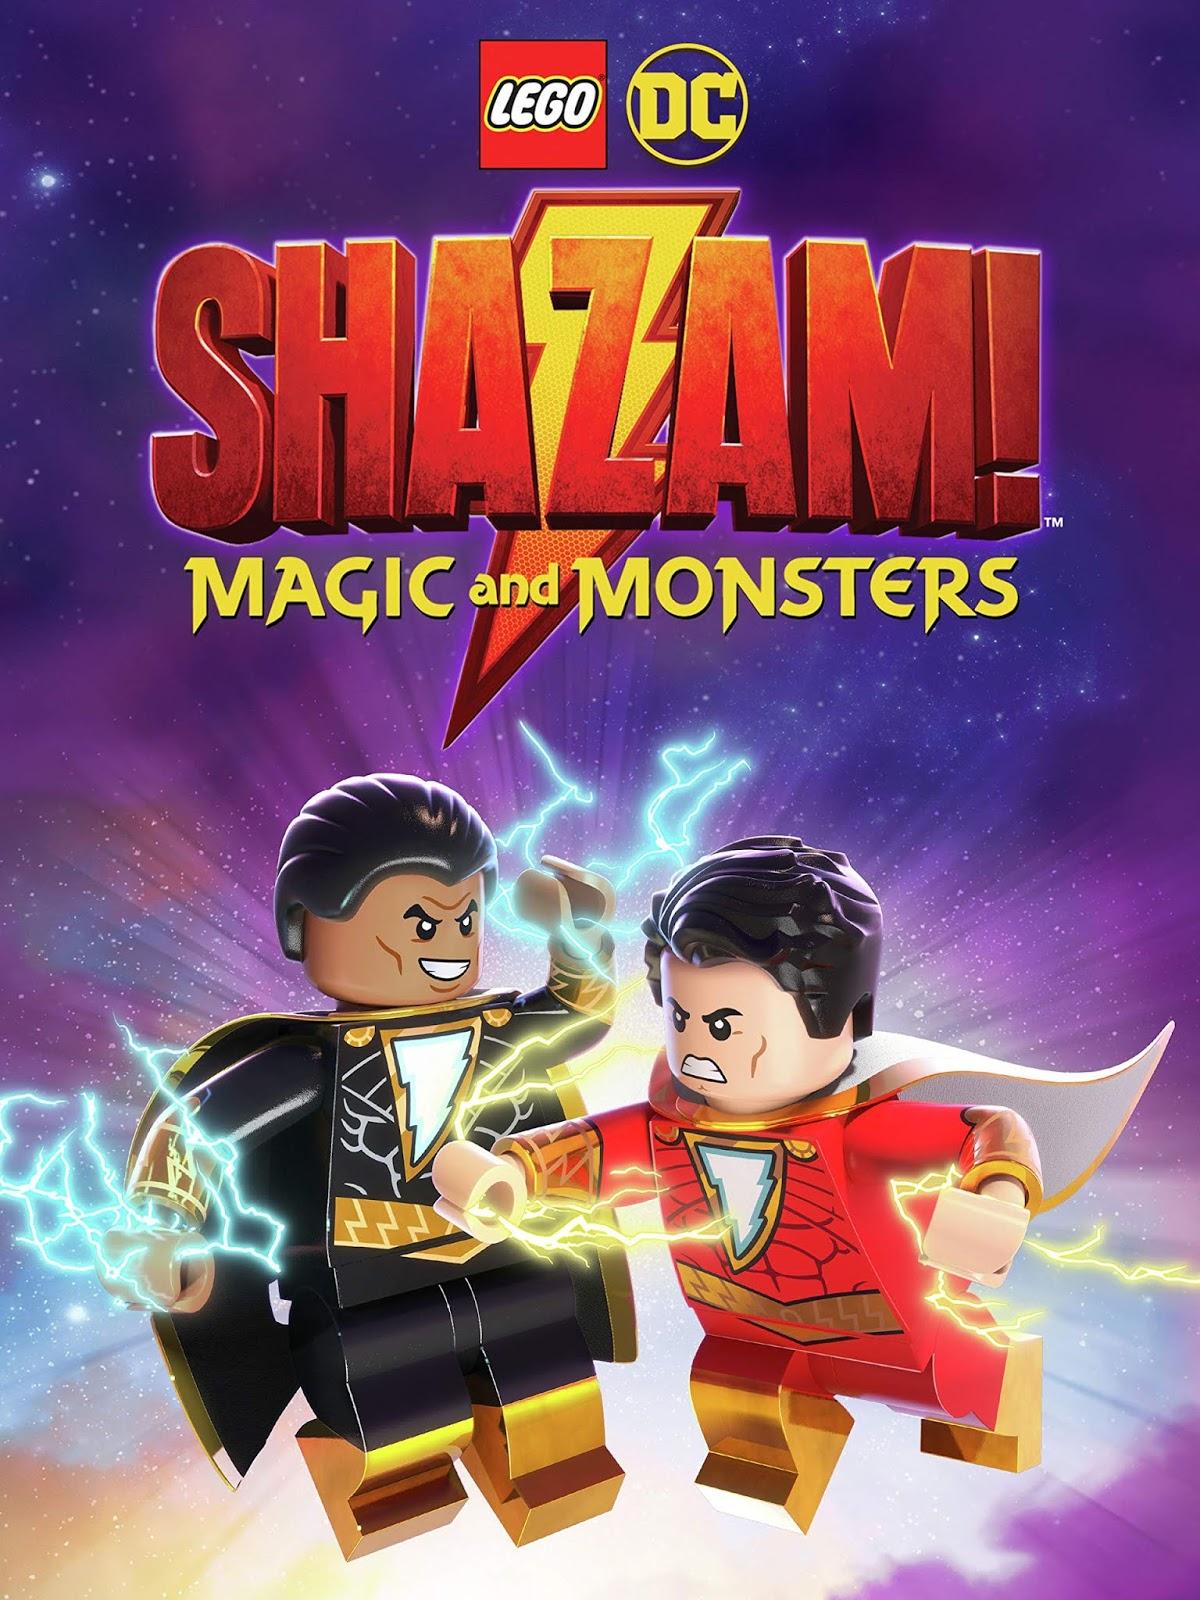 Lego DC: Shazam!: Magic and Monsters [2020] [DVDR] [NTSC] [Latino]